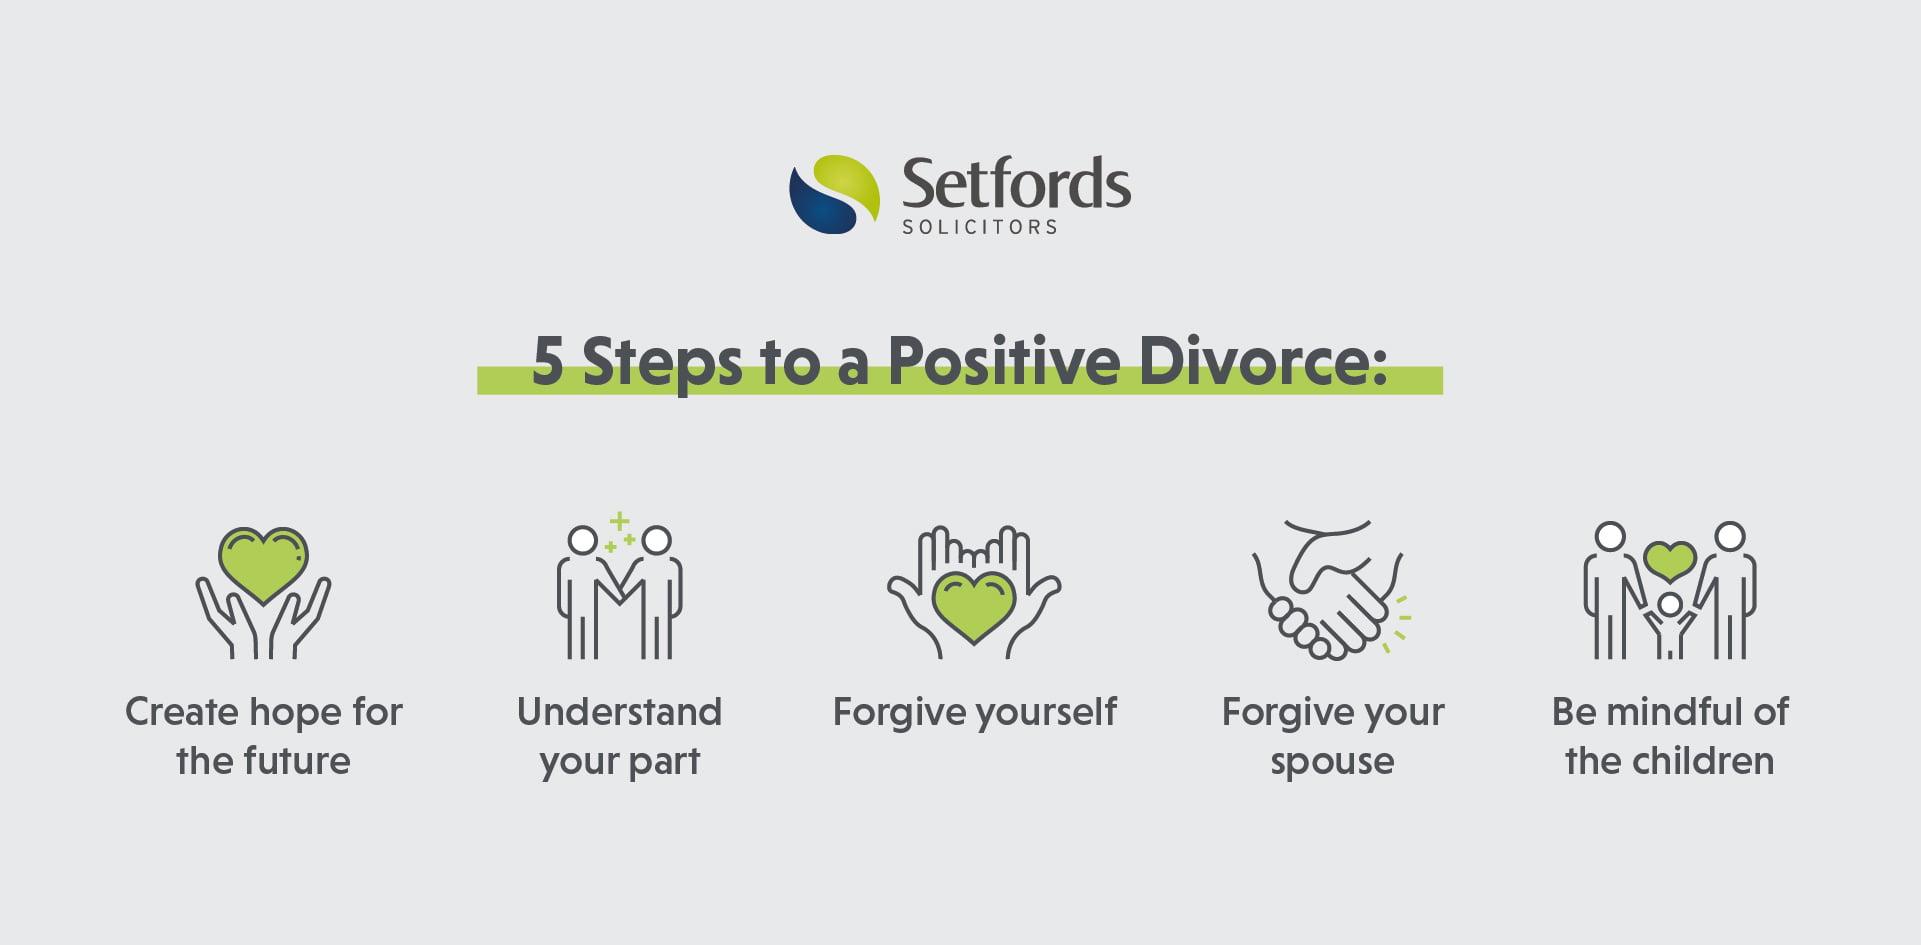 Five Steps To a Positive Divorce